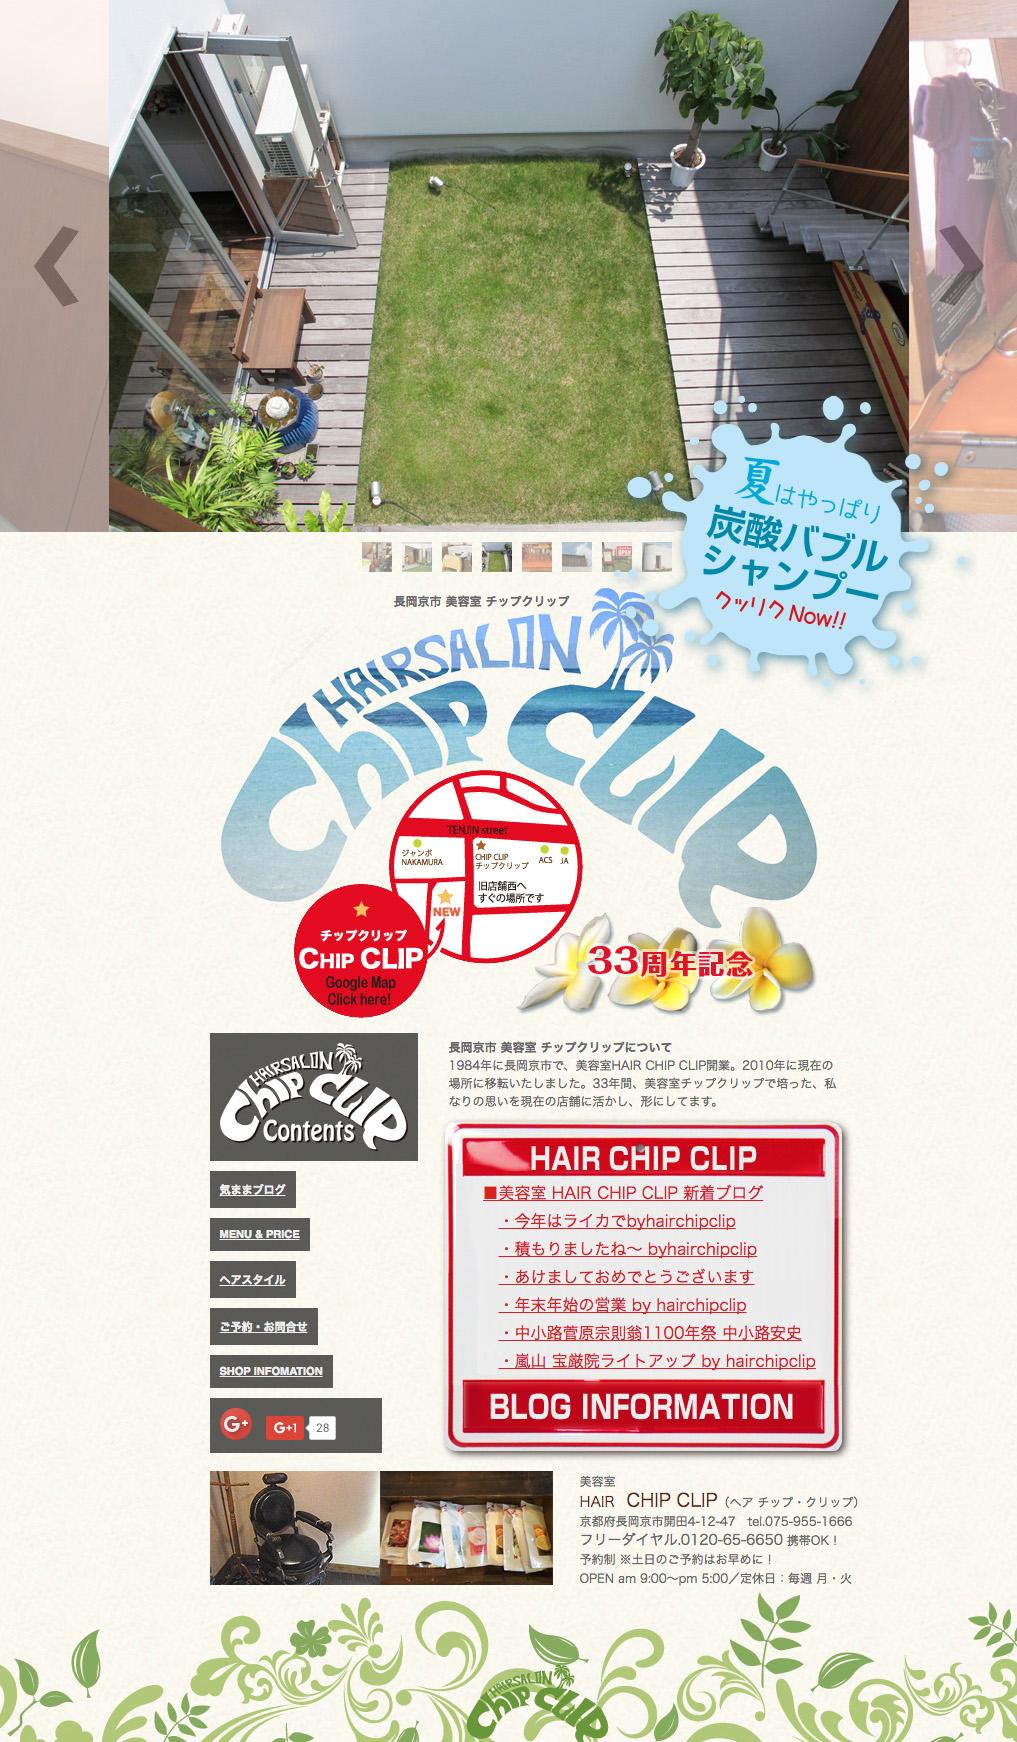 HAIR CHIP CLIP様のホームページ